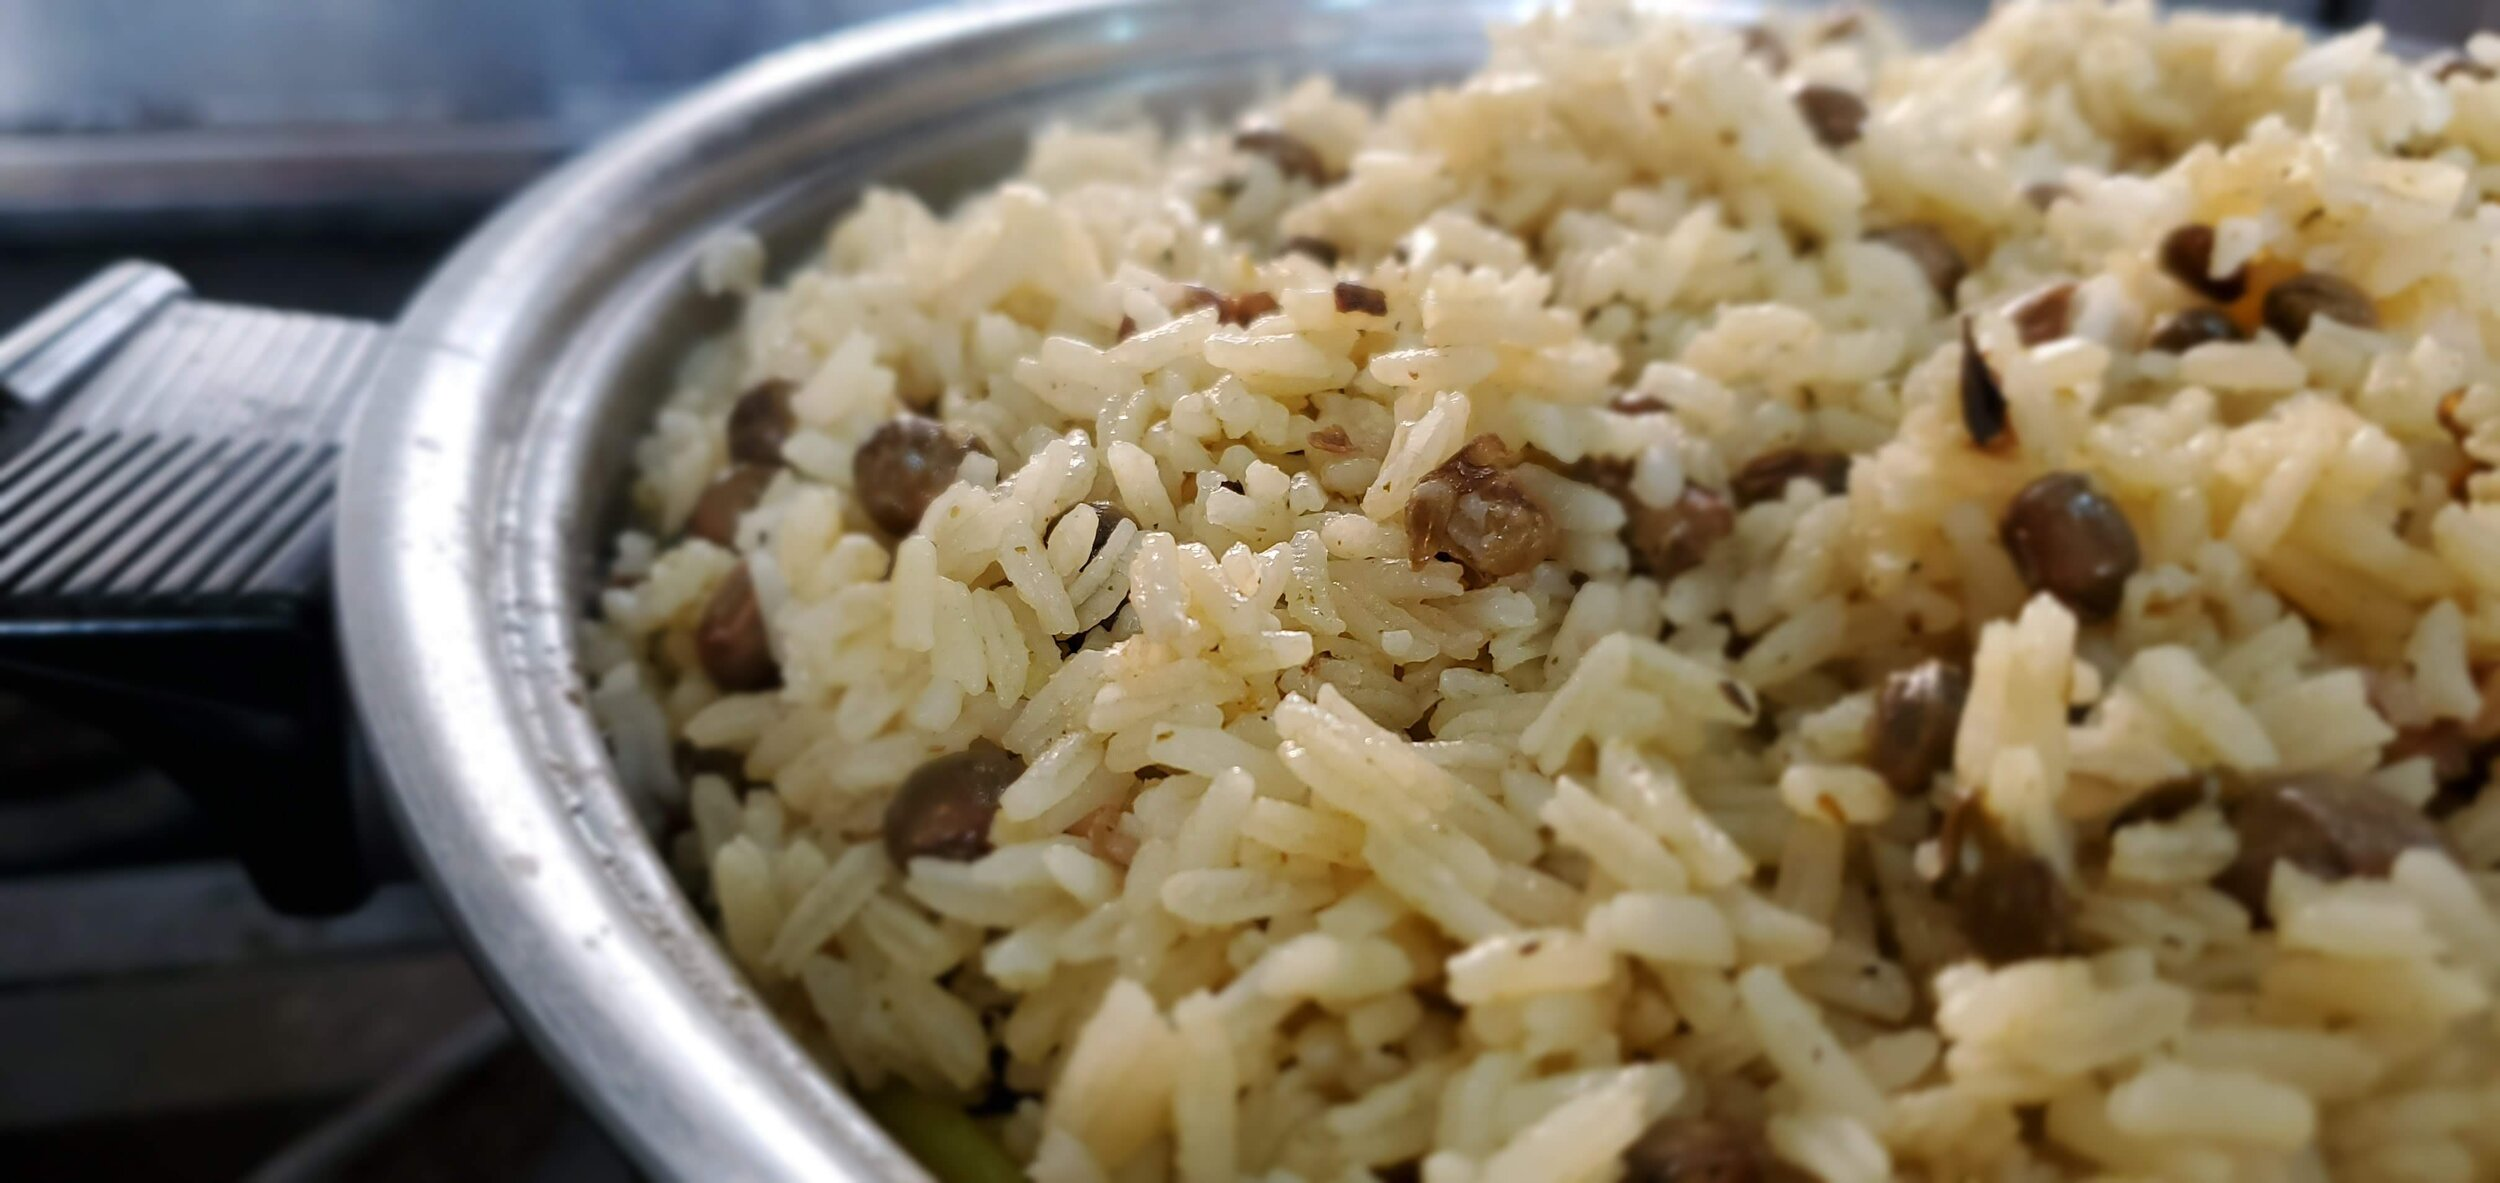 Moro de gandules con coco - Coconut milk rice with pigeon pease